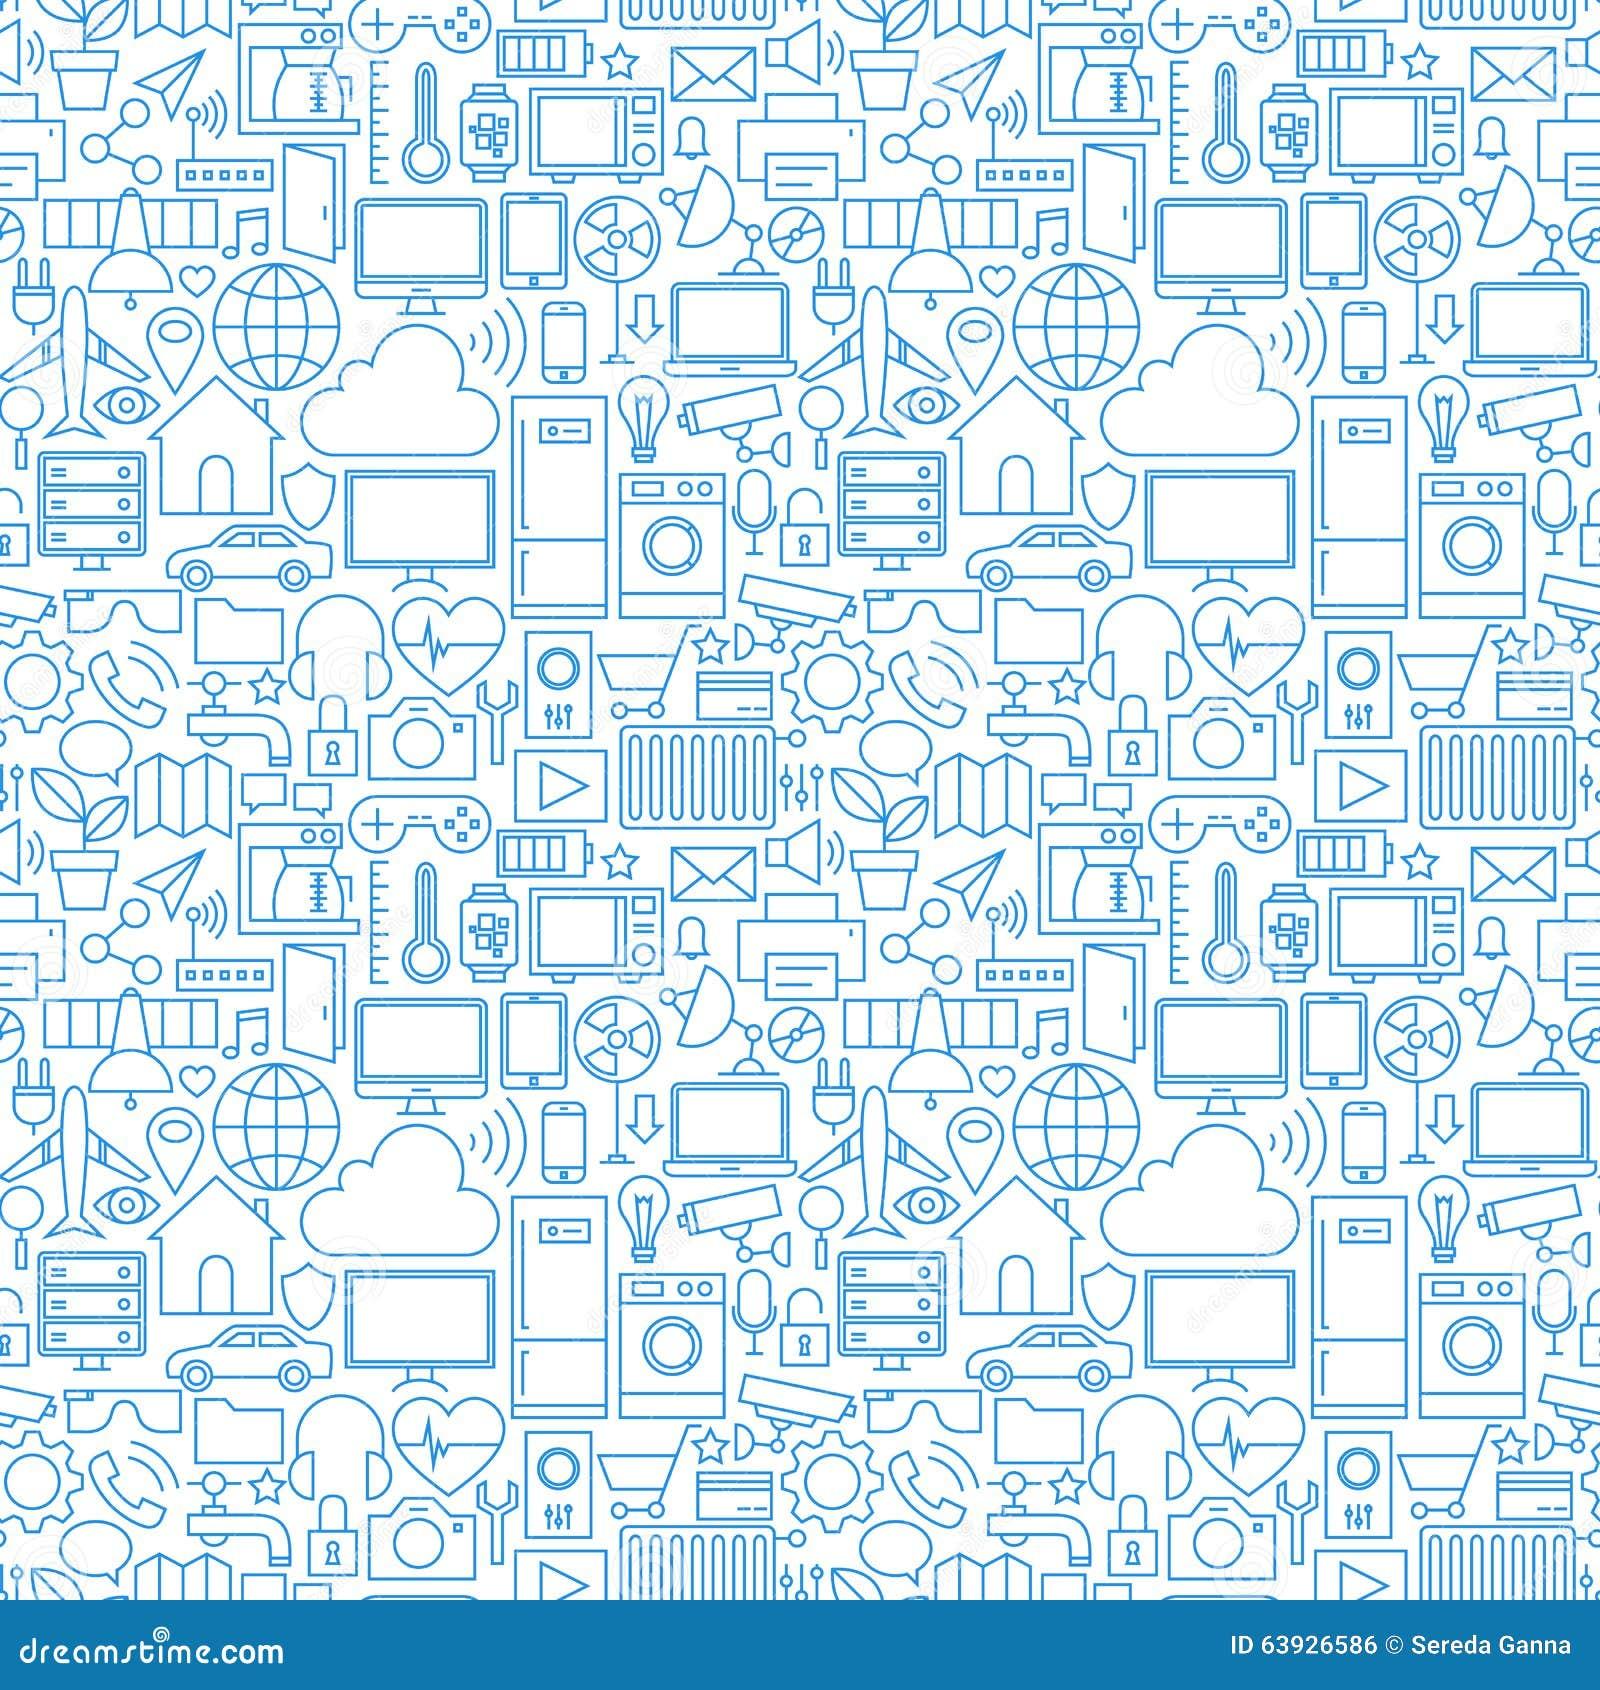 Internet/Broadband Fact Sheet